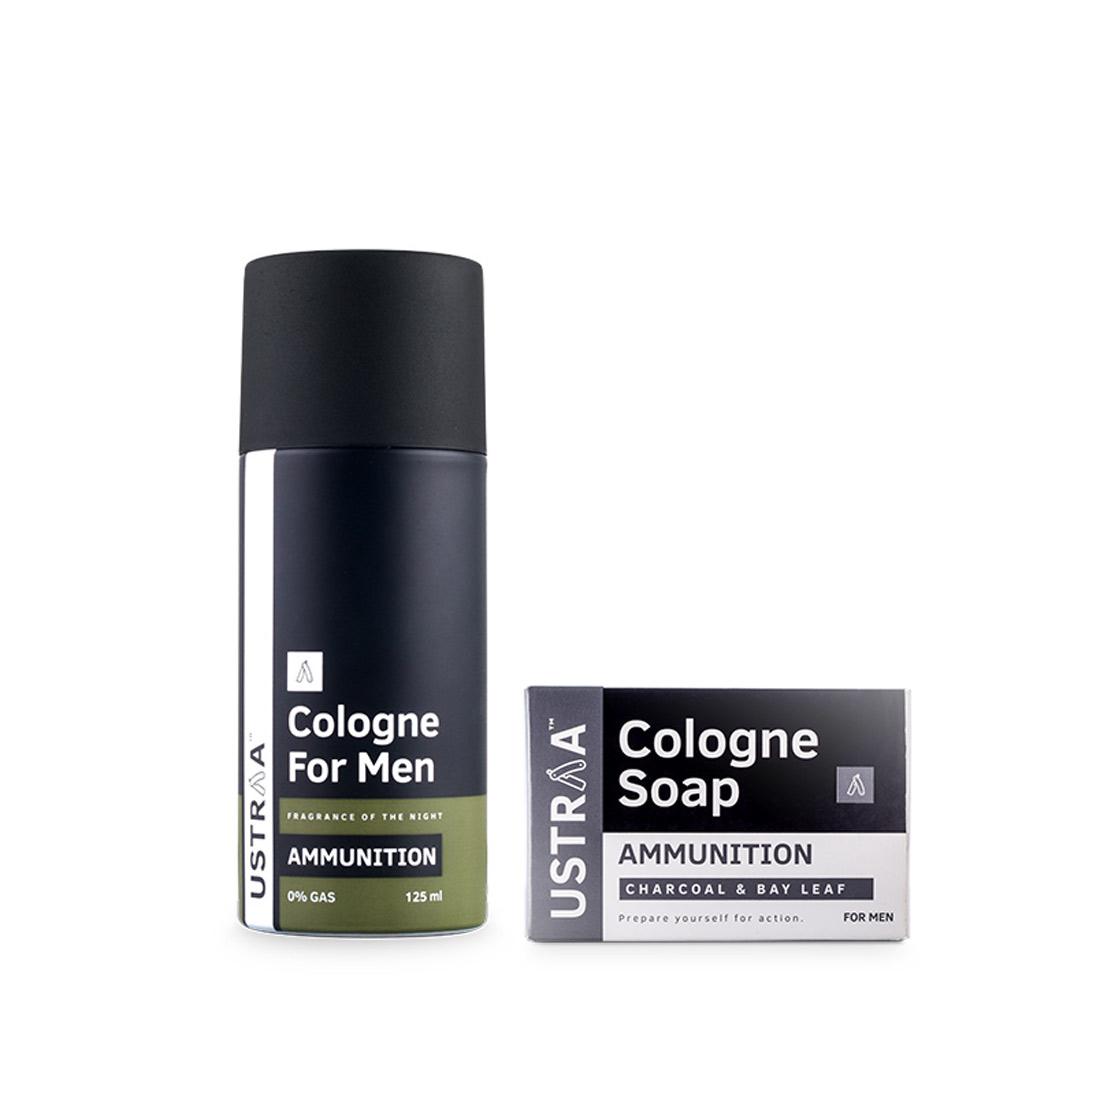 Cologne Spray - Ammunition & Cologne Soap - Ammunition